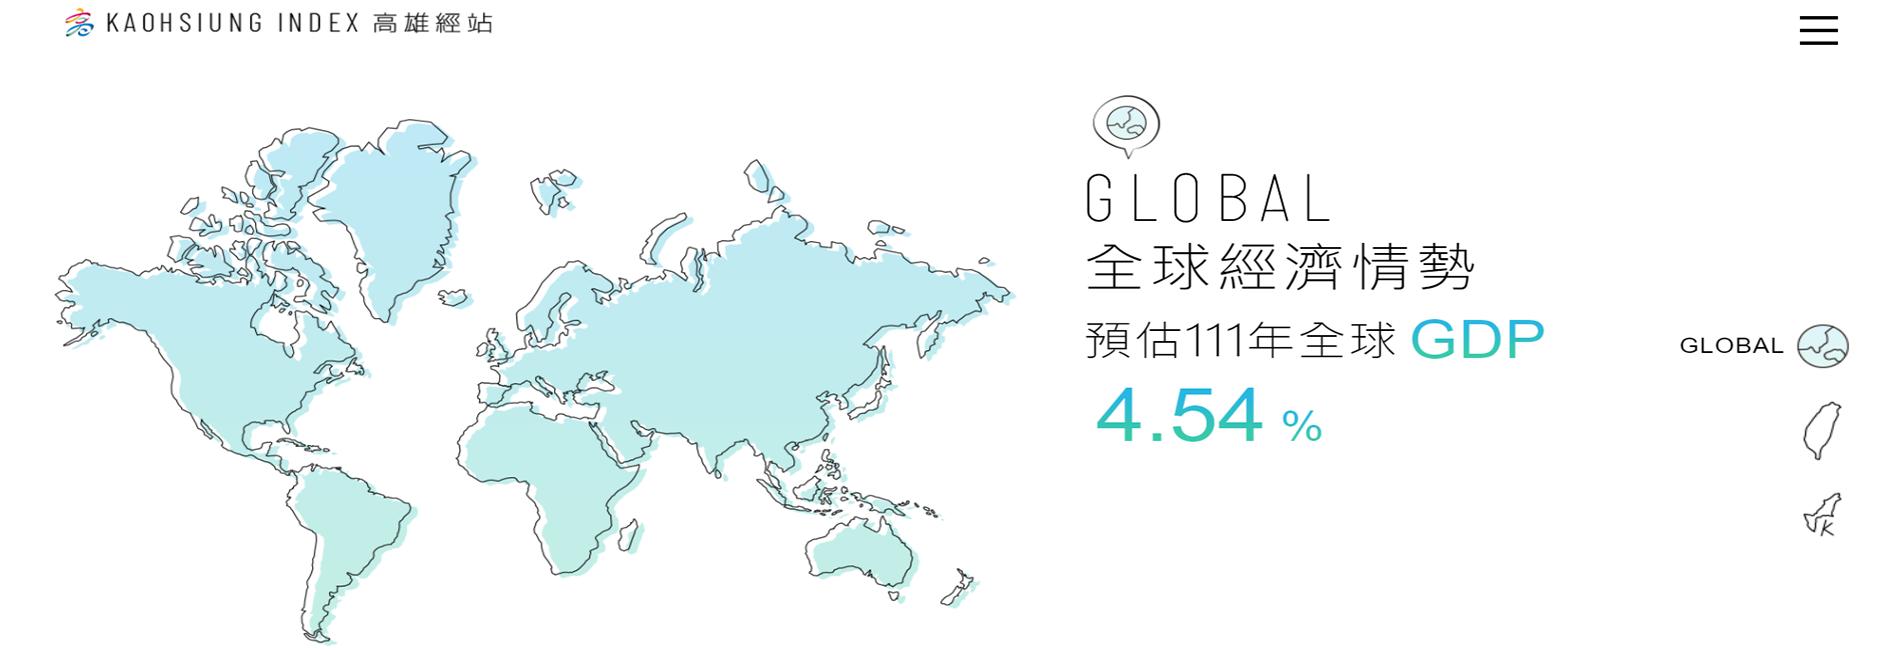 高雄經站Kaohsiung Index